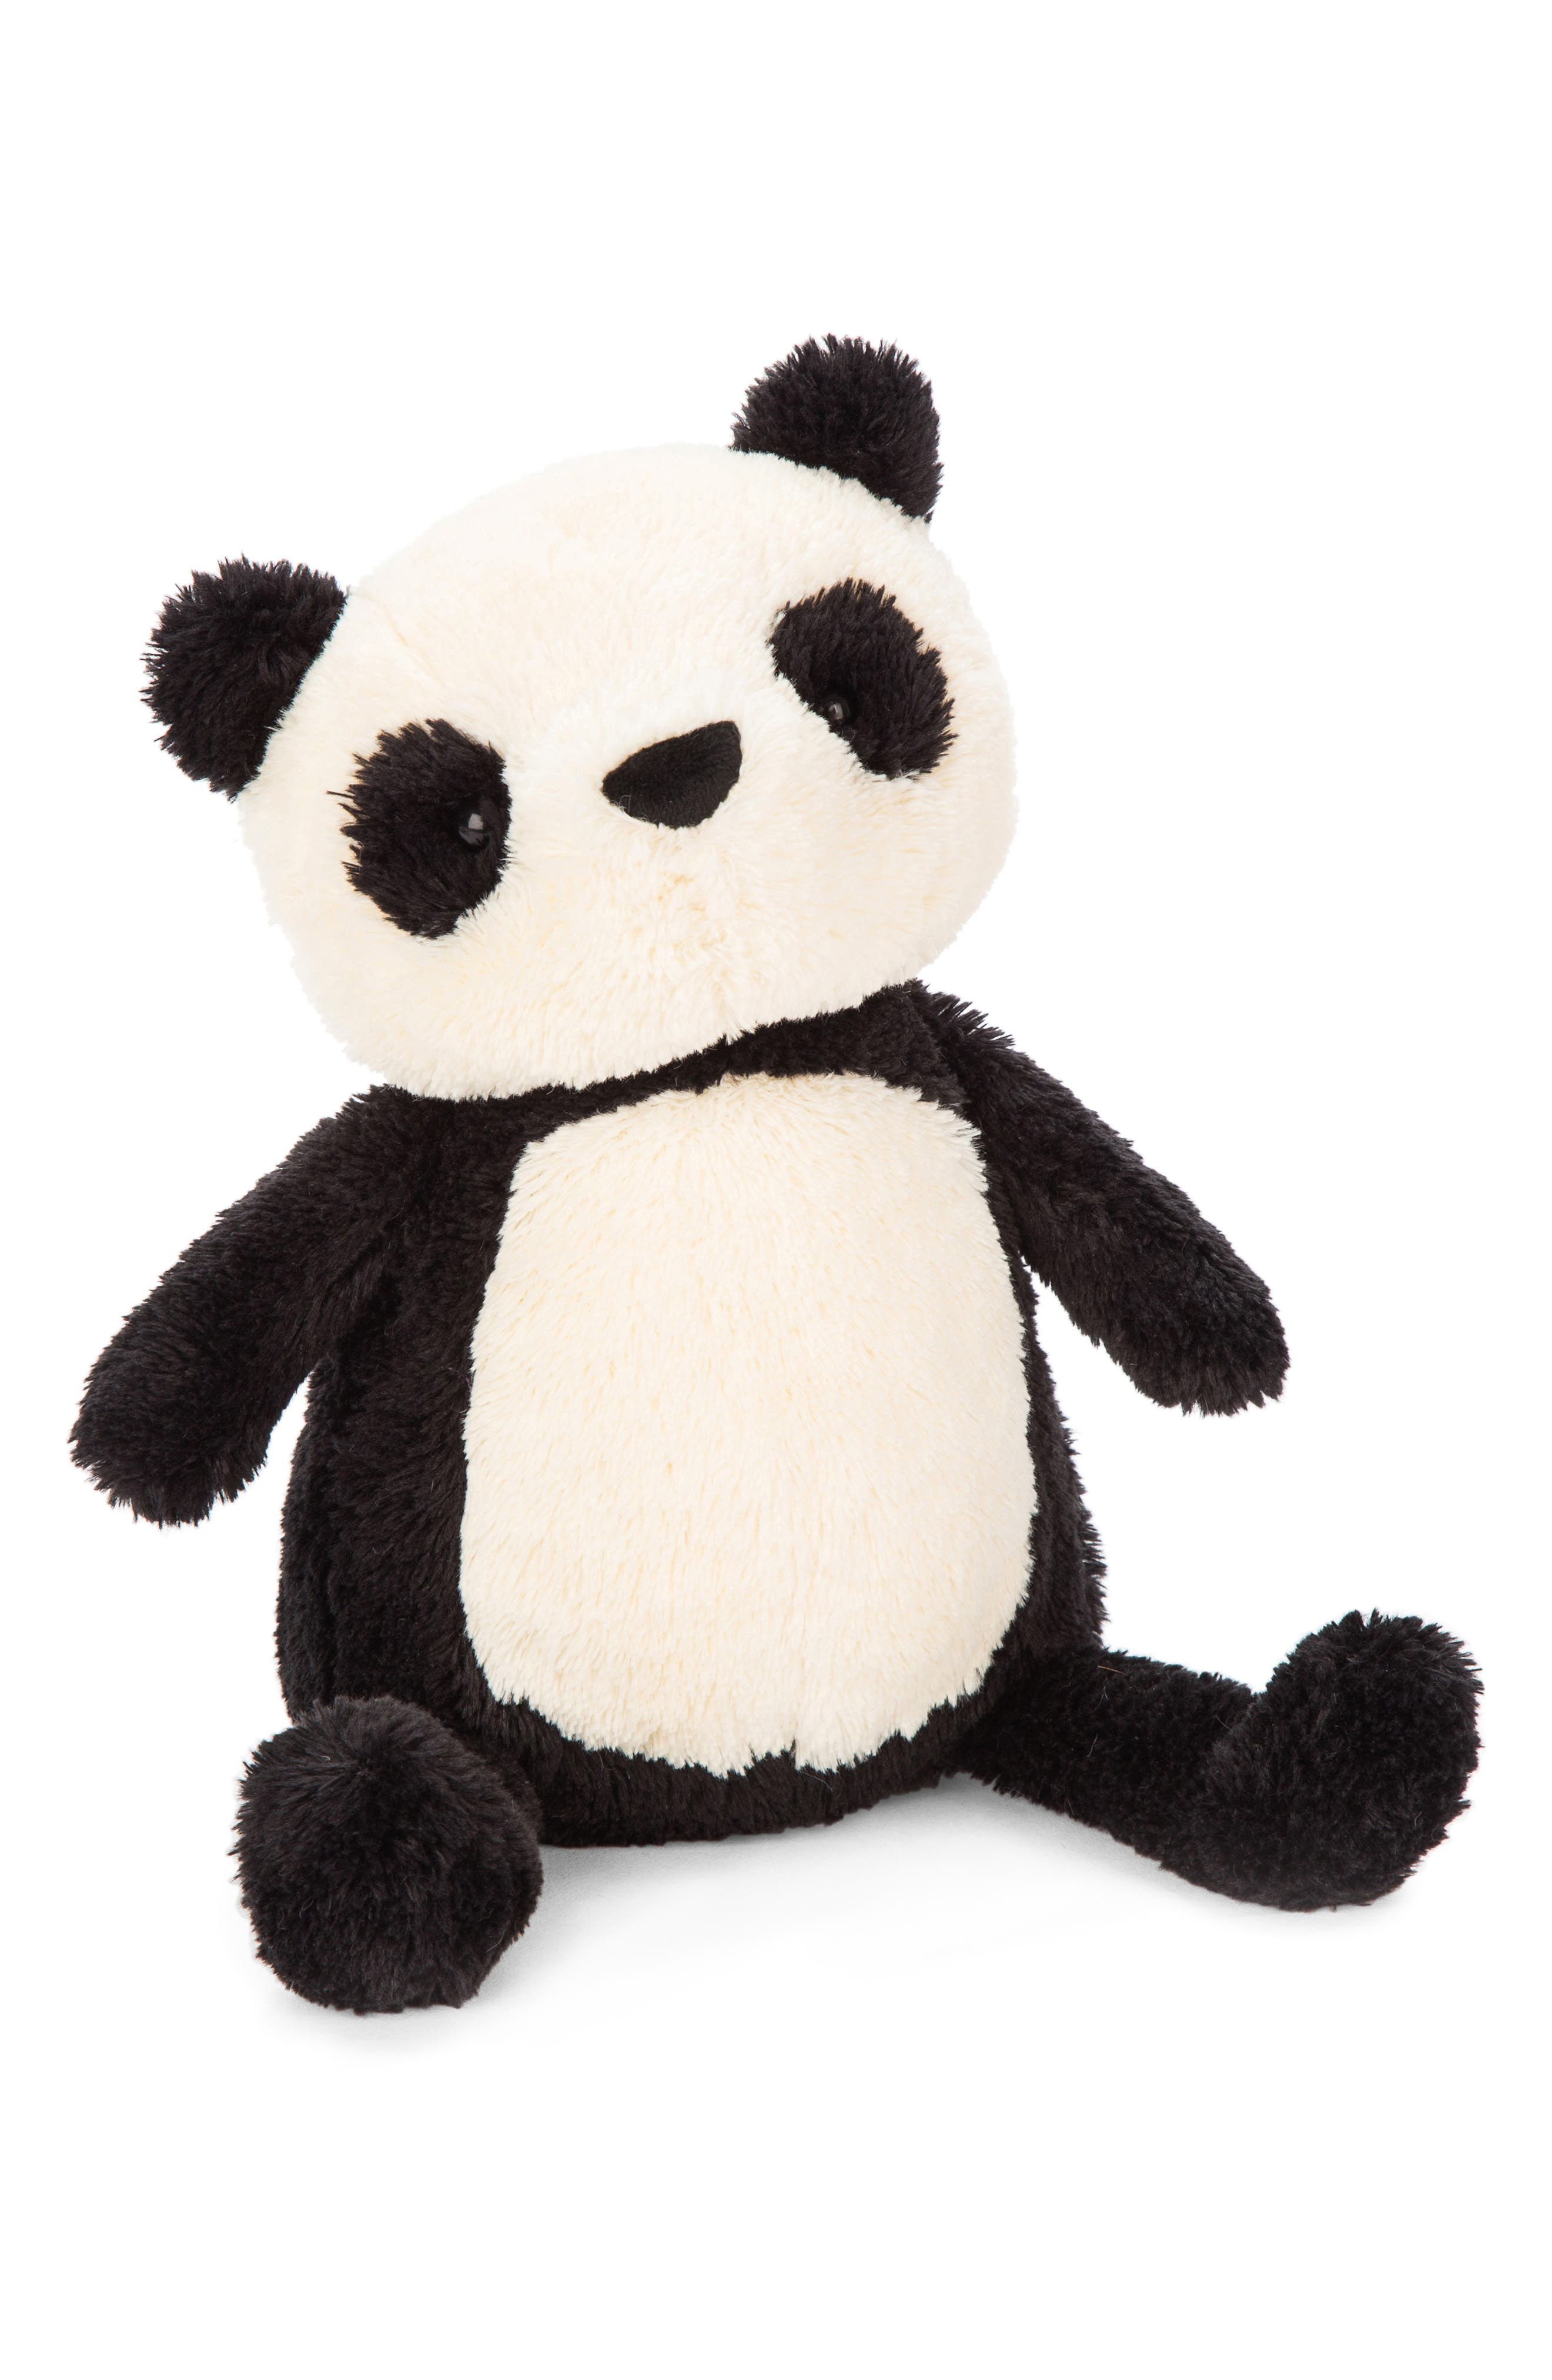 Medium Pippet Panda Stuffed Animal,                         Main,                         color, BLACK / WHITE